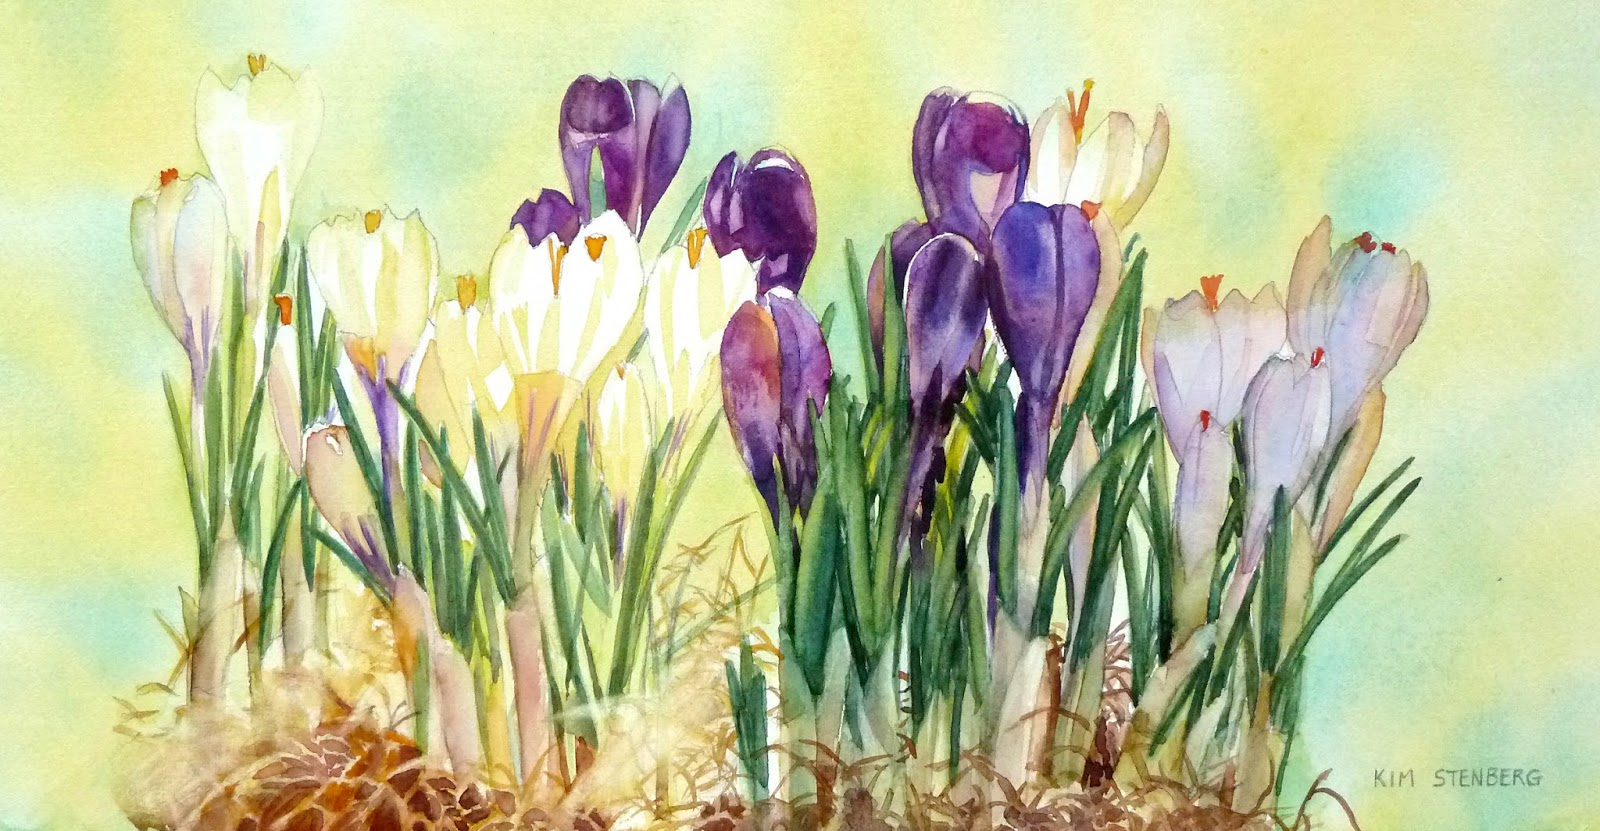 Kim stenberg 39 s painting journal spring light for Spring flowers watercolor